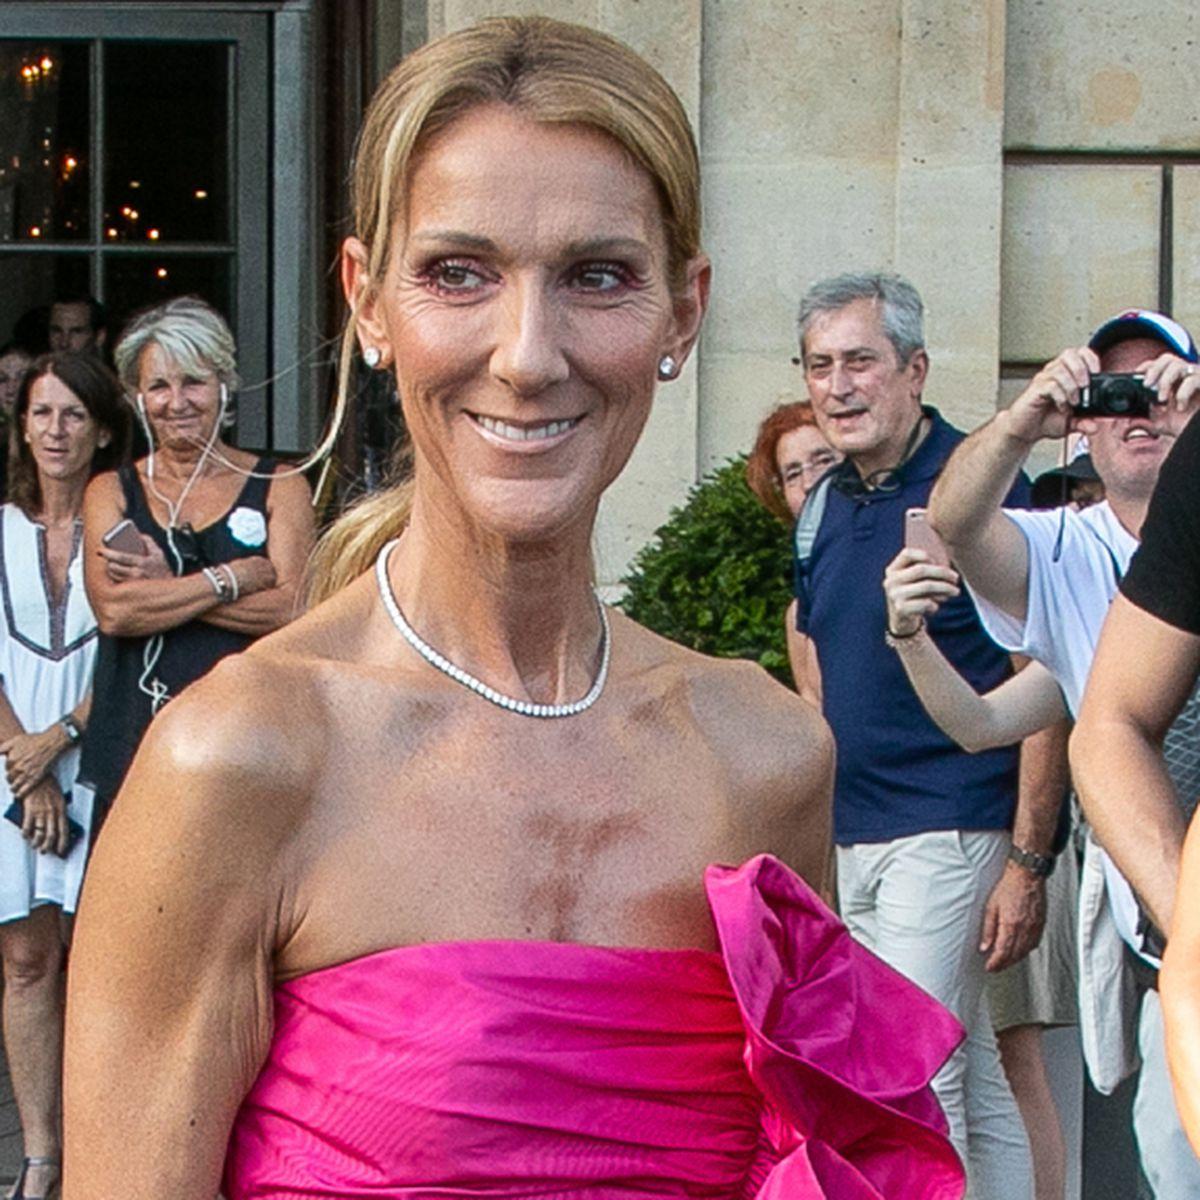 Celine Dion Tests Negative For Coronavirus After Cancelling Shows 9celebrity